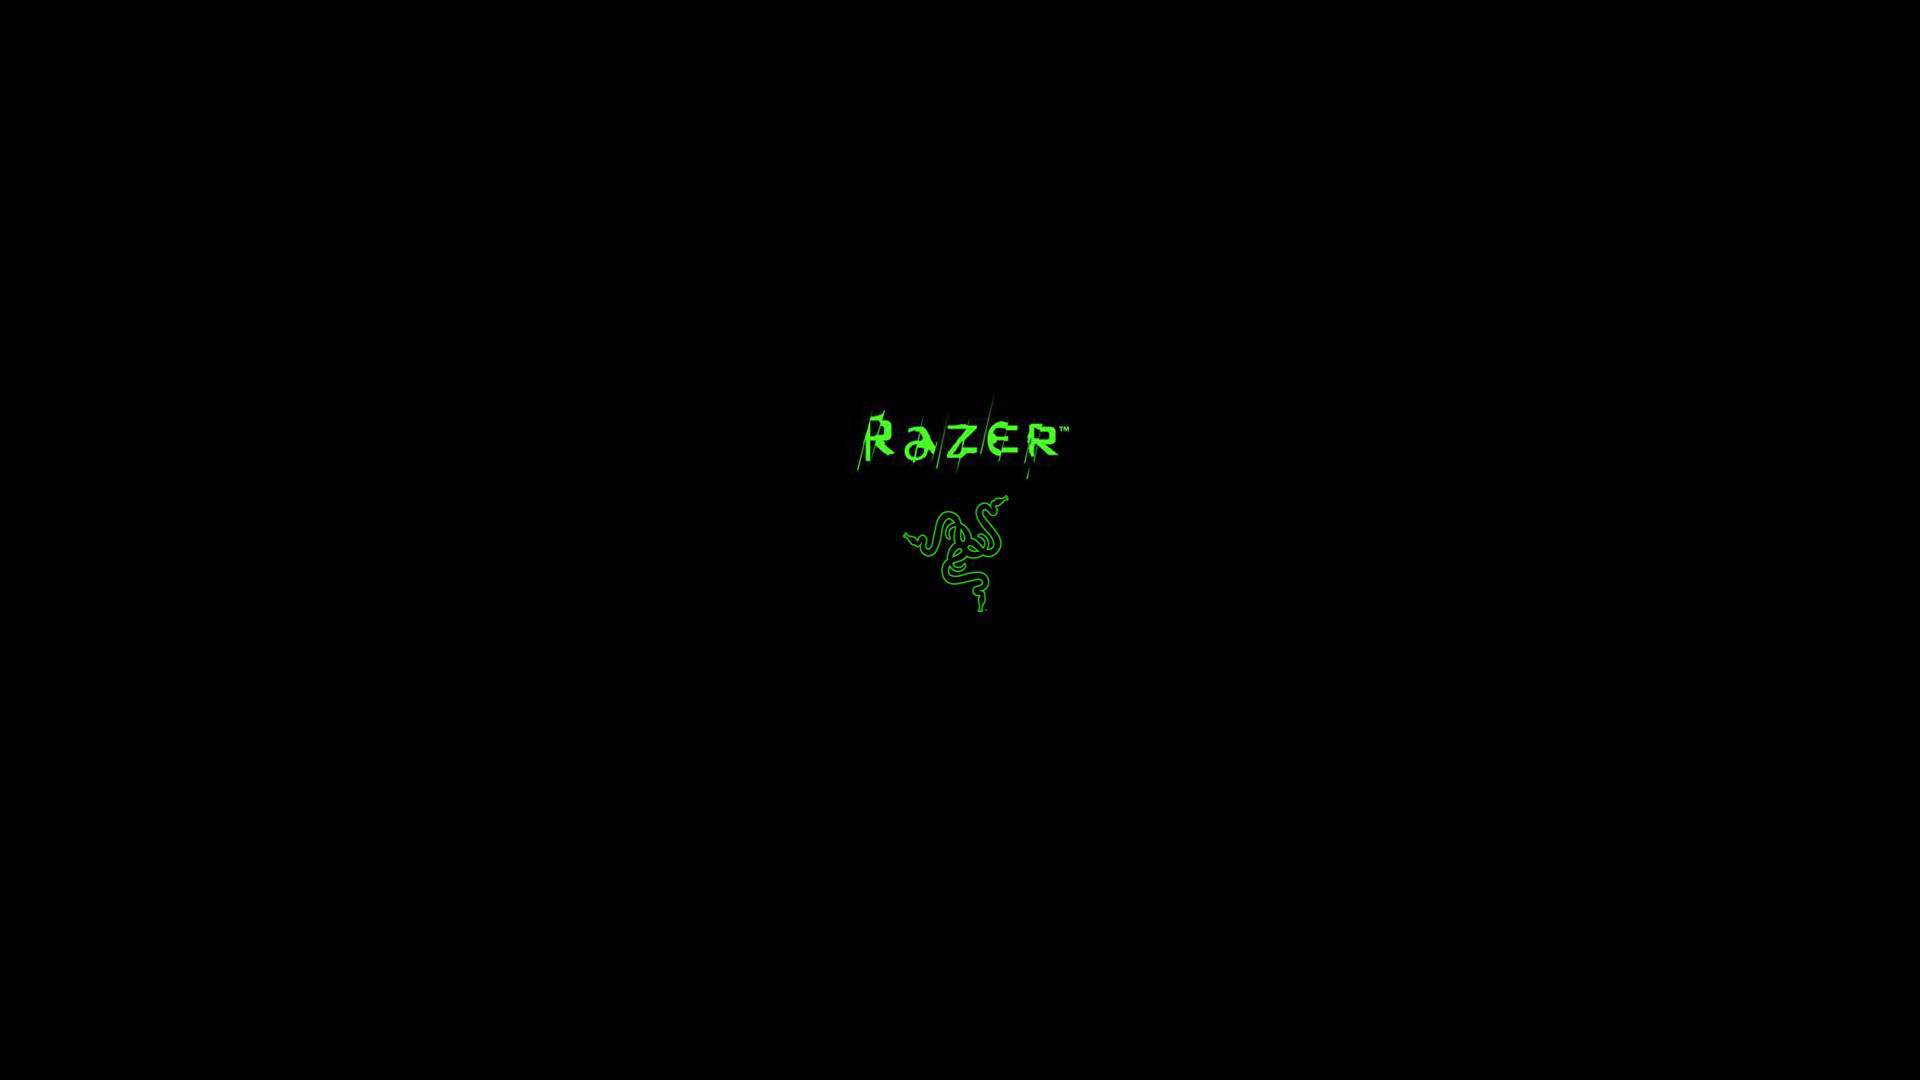 <b>Razer Logo</b> Animated <b>Wallpaper</